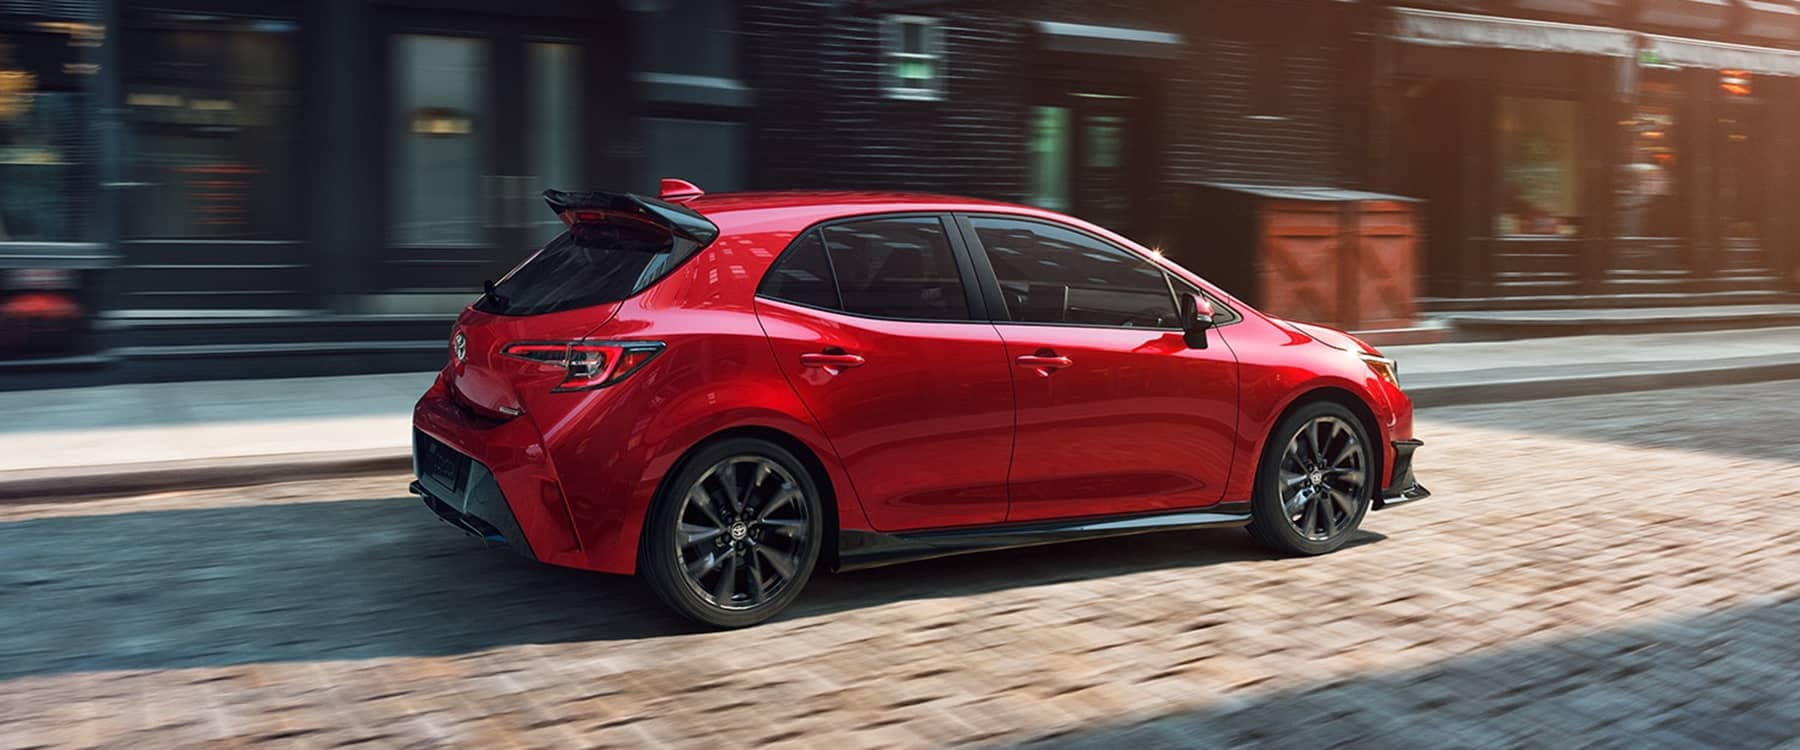 2021 Toyota Corolla Hatchback driving down brick road